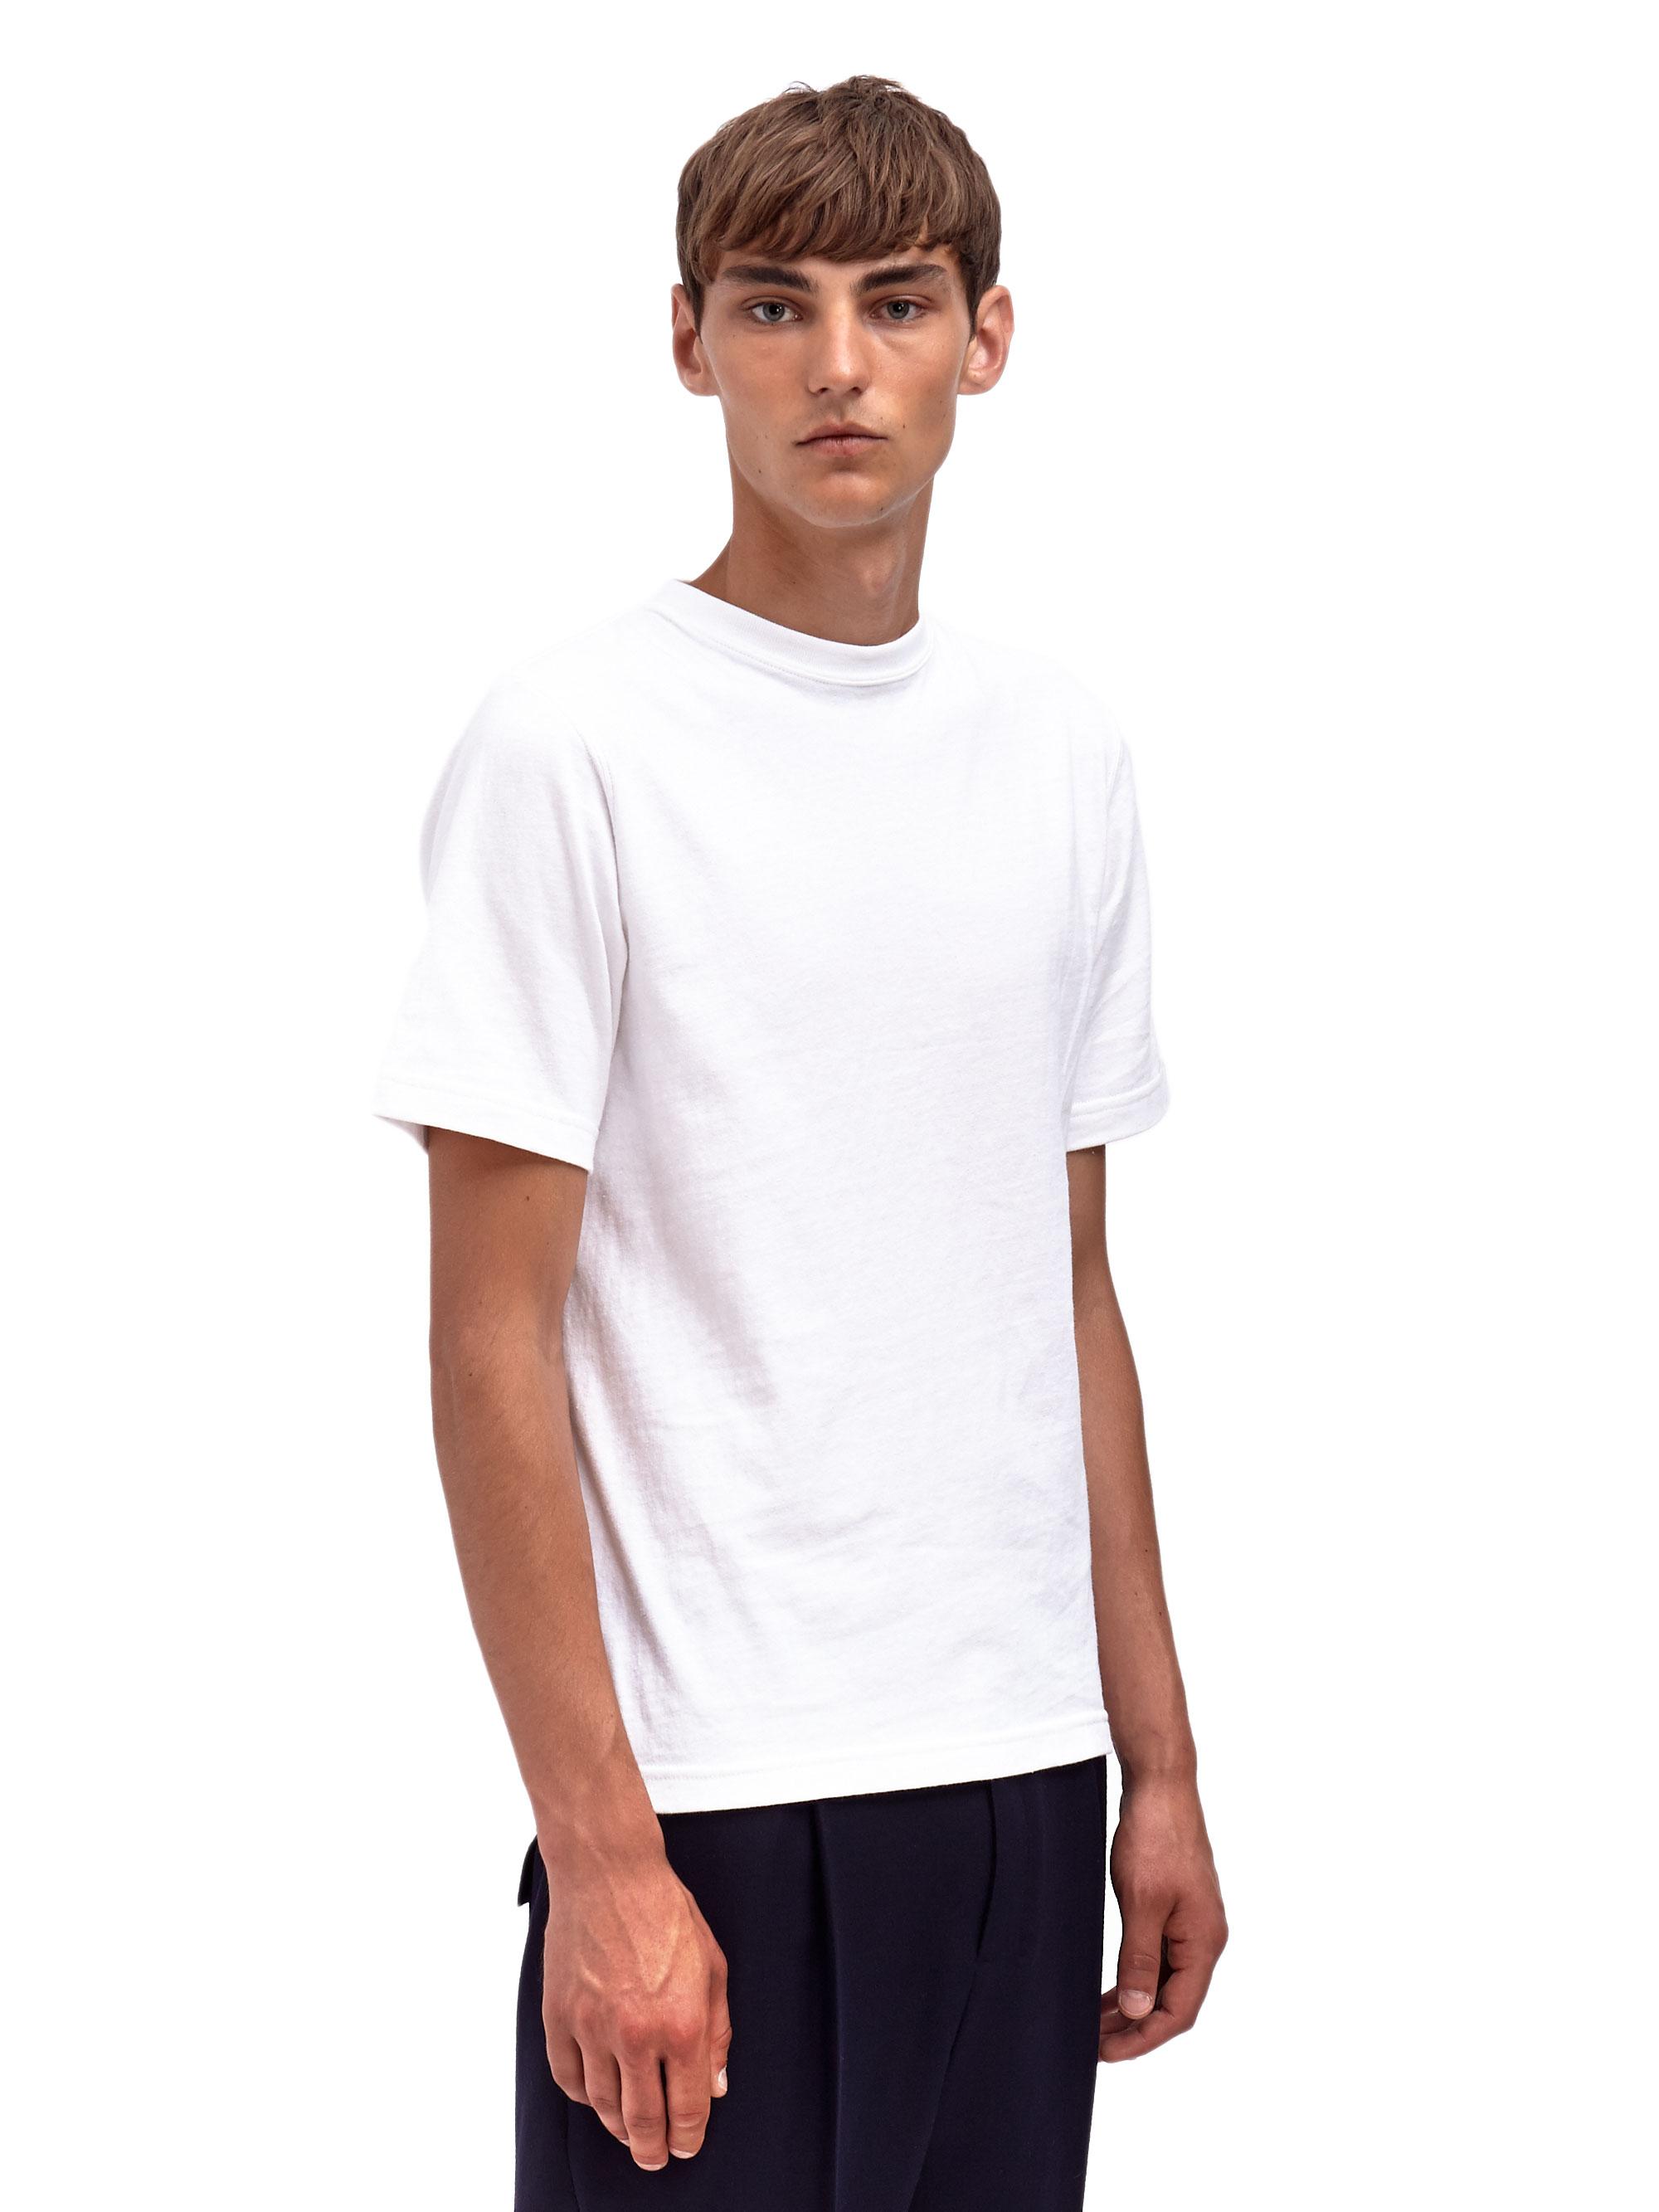 TOPWEAR - T-shirts Harry Stedman Buy Cheap Shop For a6Fz1NL2